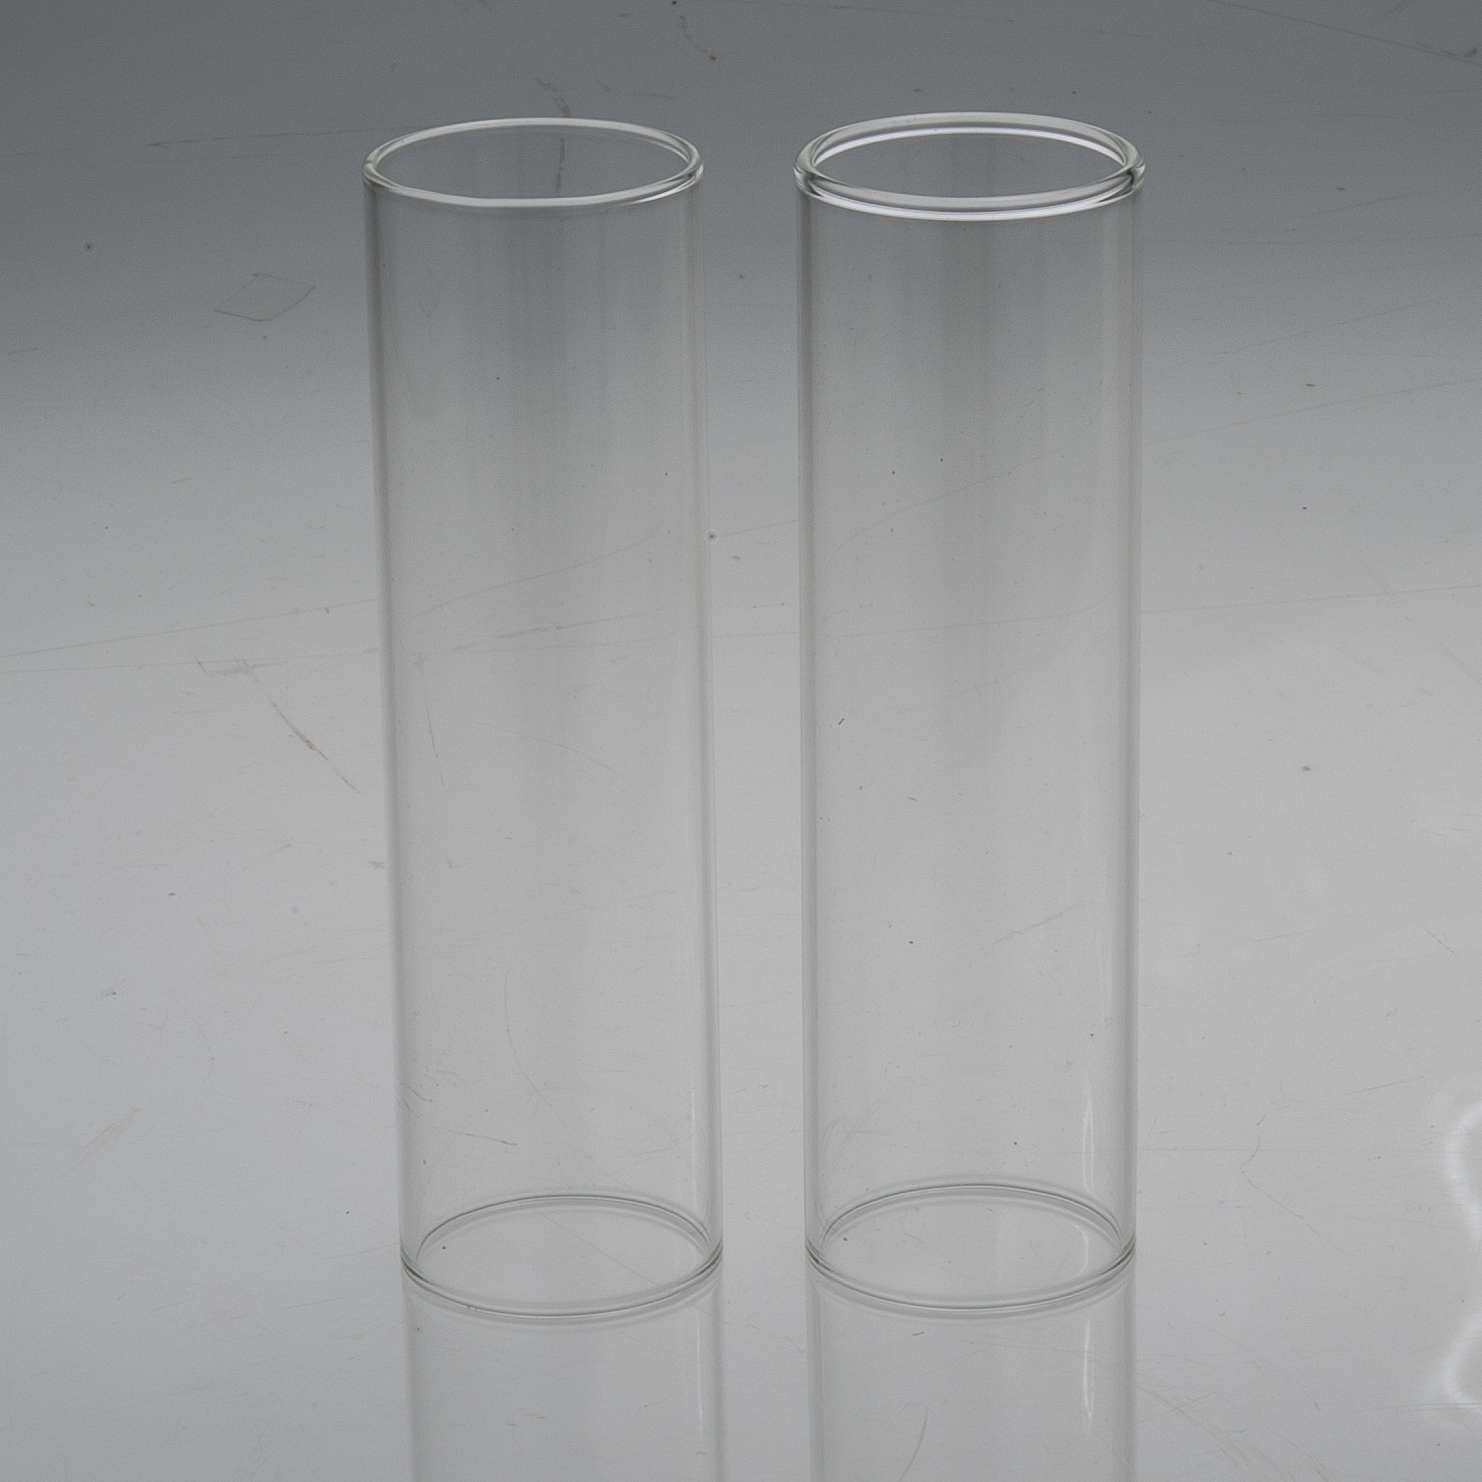 Wind-proof glass, 2 pieces set. 3,5 cm diameter 3